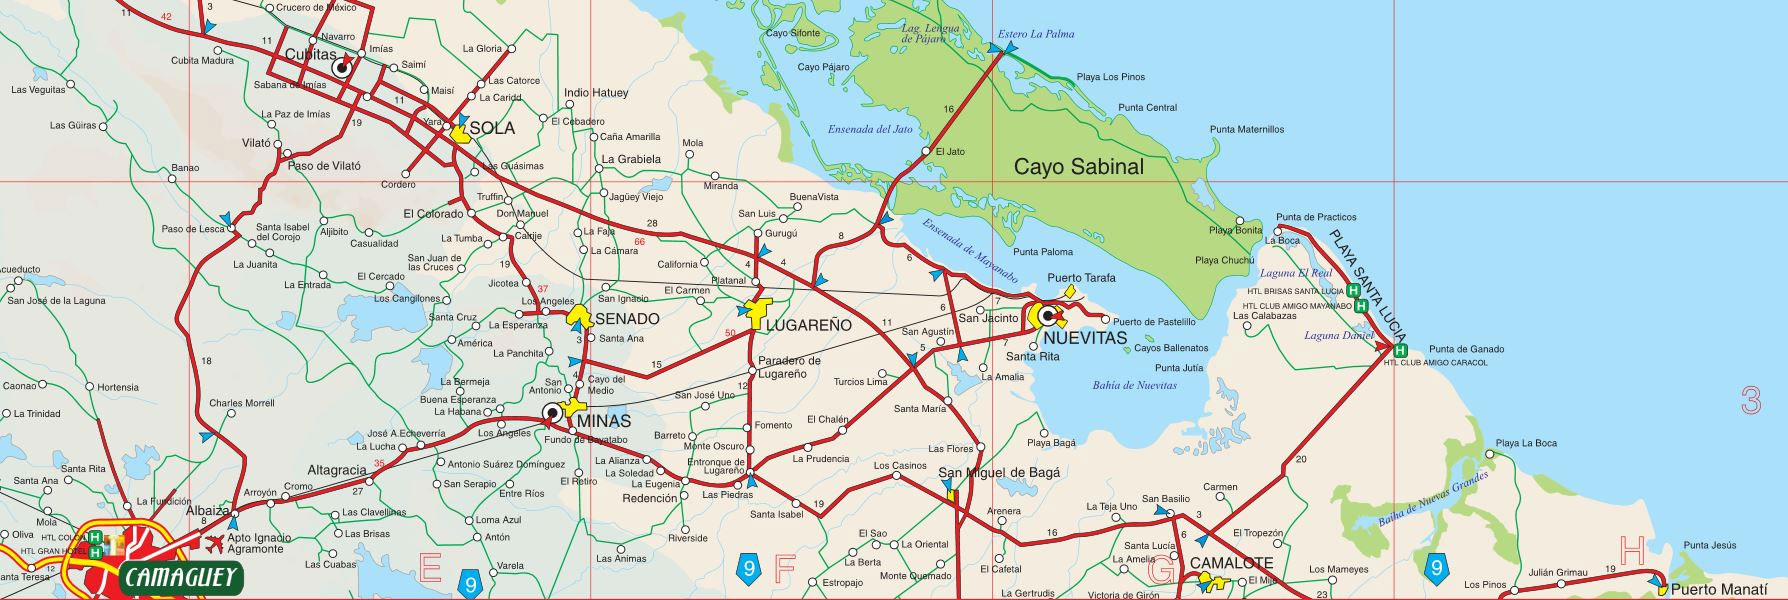 Mapa Camaguey Cayo Sabinal Playa Santa Lucia wwwparticubanet